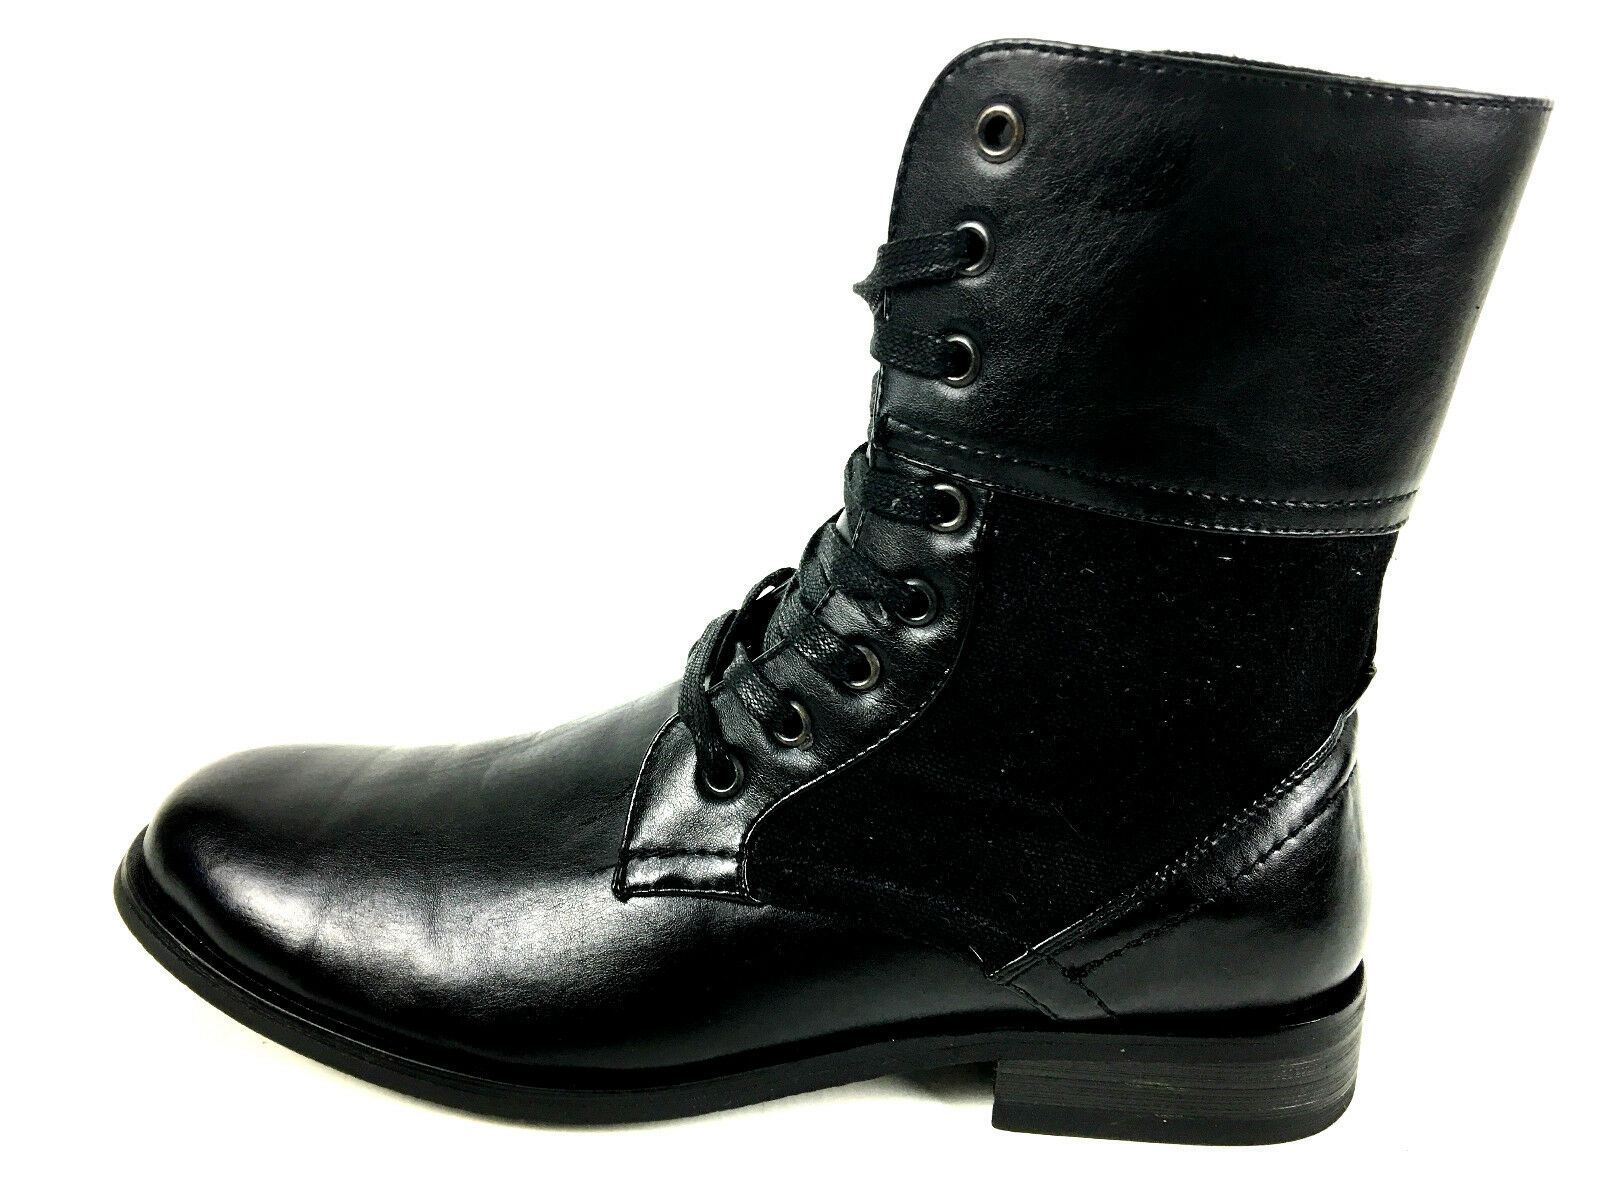 UH Men's  Black Mid Lace up  Boots Size 10 US.